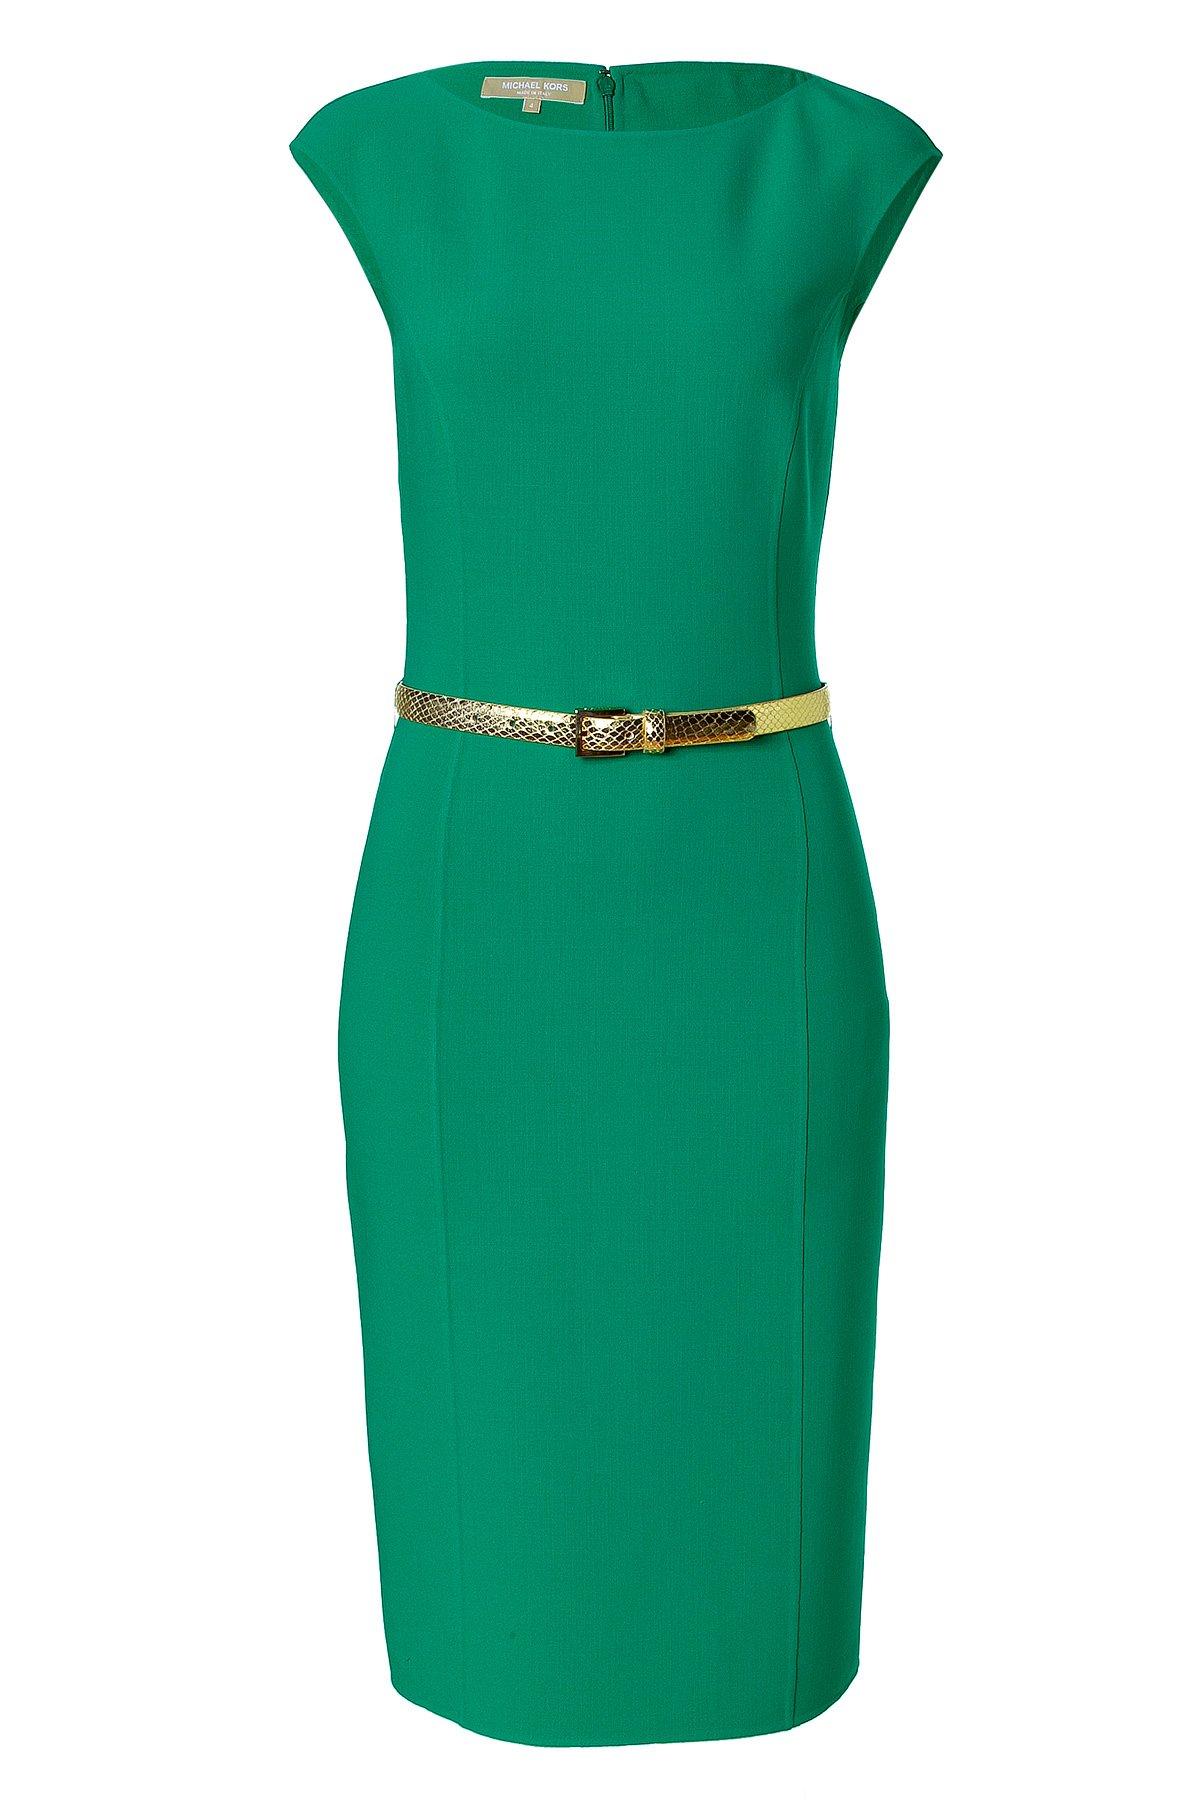 Michael Kors Emerald Belted Wool Blend Sheath Dress In